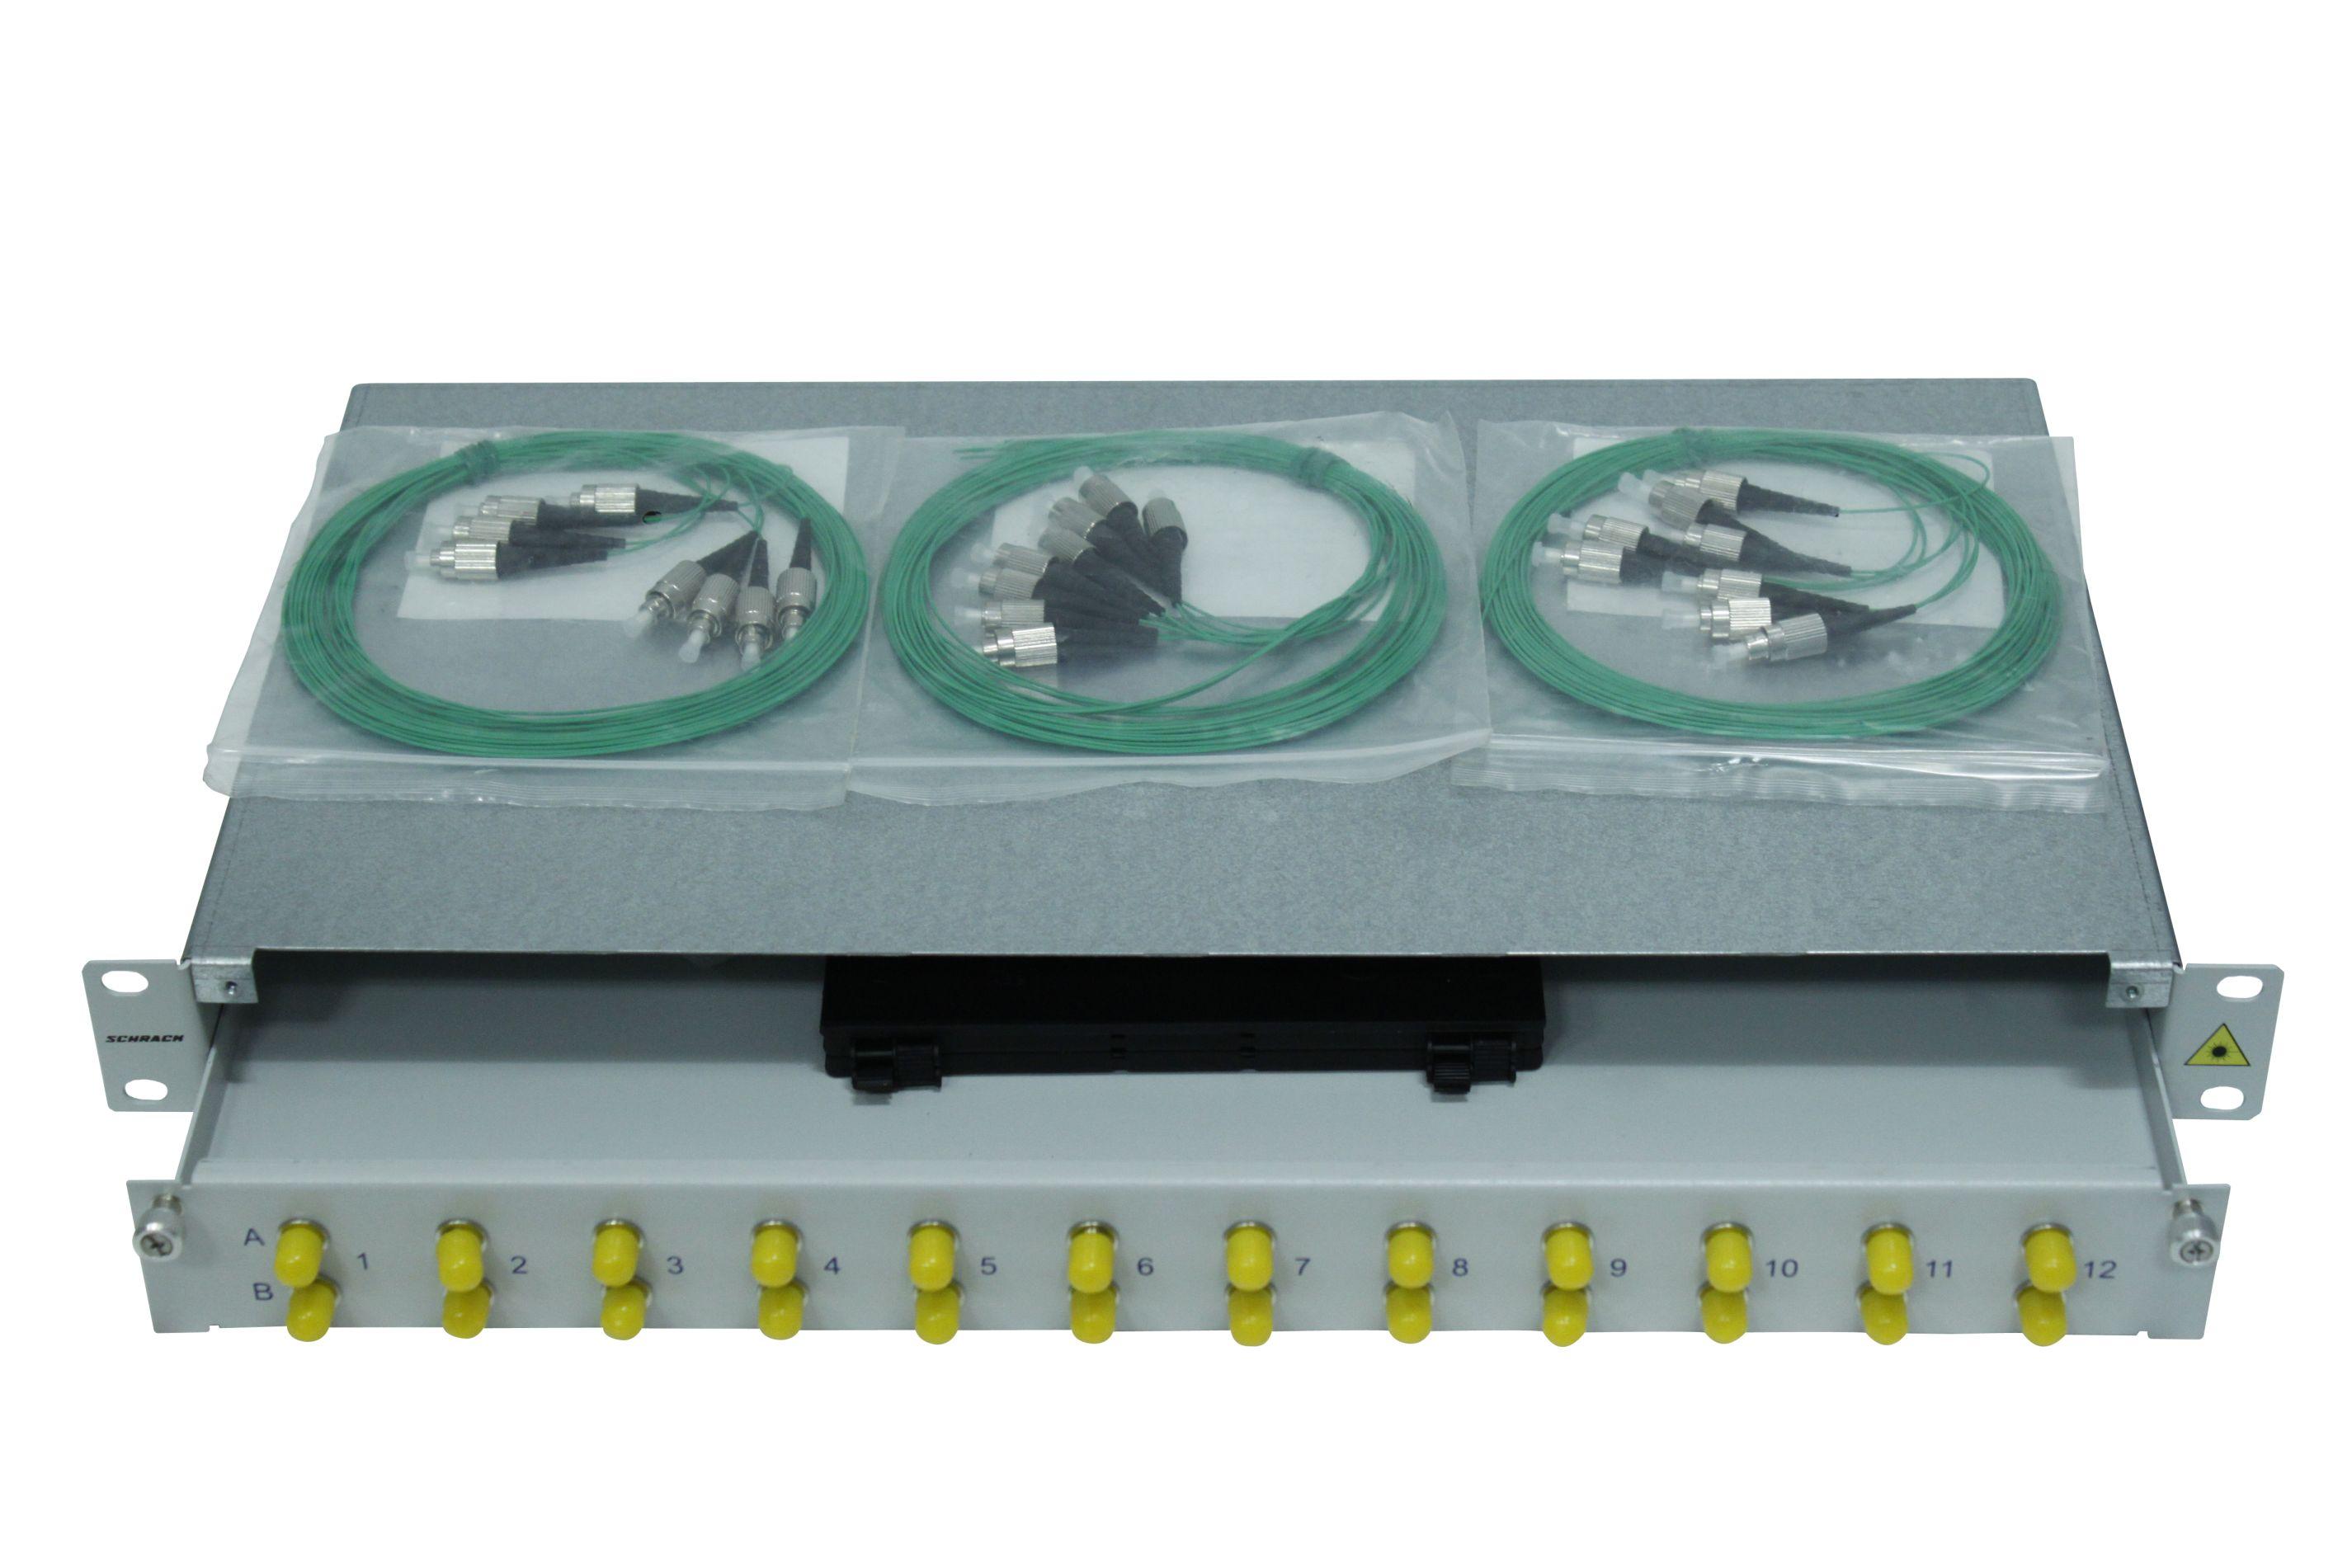 1 Stk LWL Spleißbox, 12Fasern, FC, 62,5/125µm OM1, 19, 1HE HSELS126FG